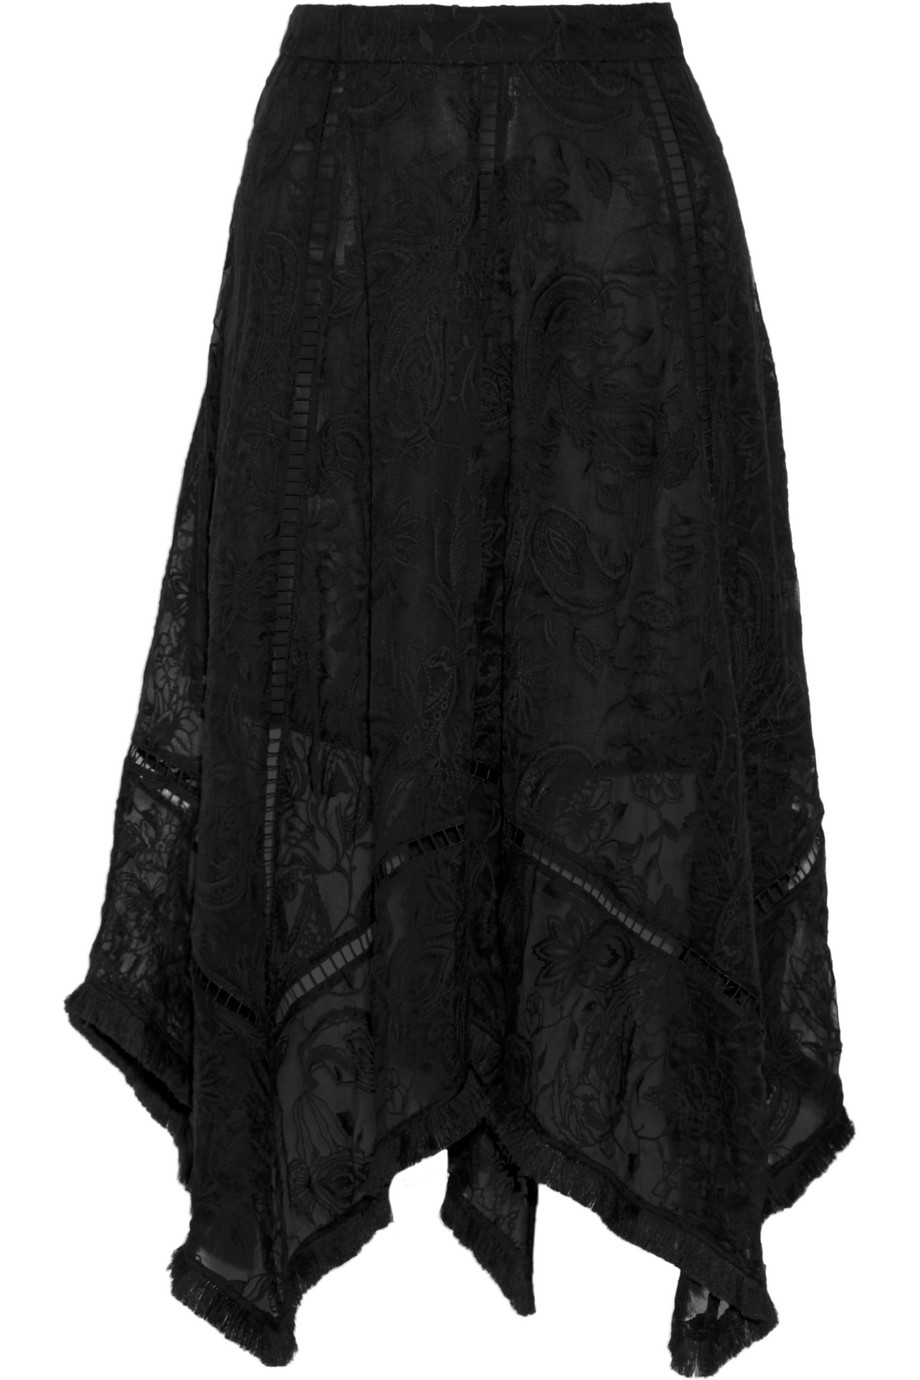 Zimmermann Henna Fringed Embroidered Silk Skirt, Black, Women's, Size: 1